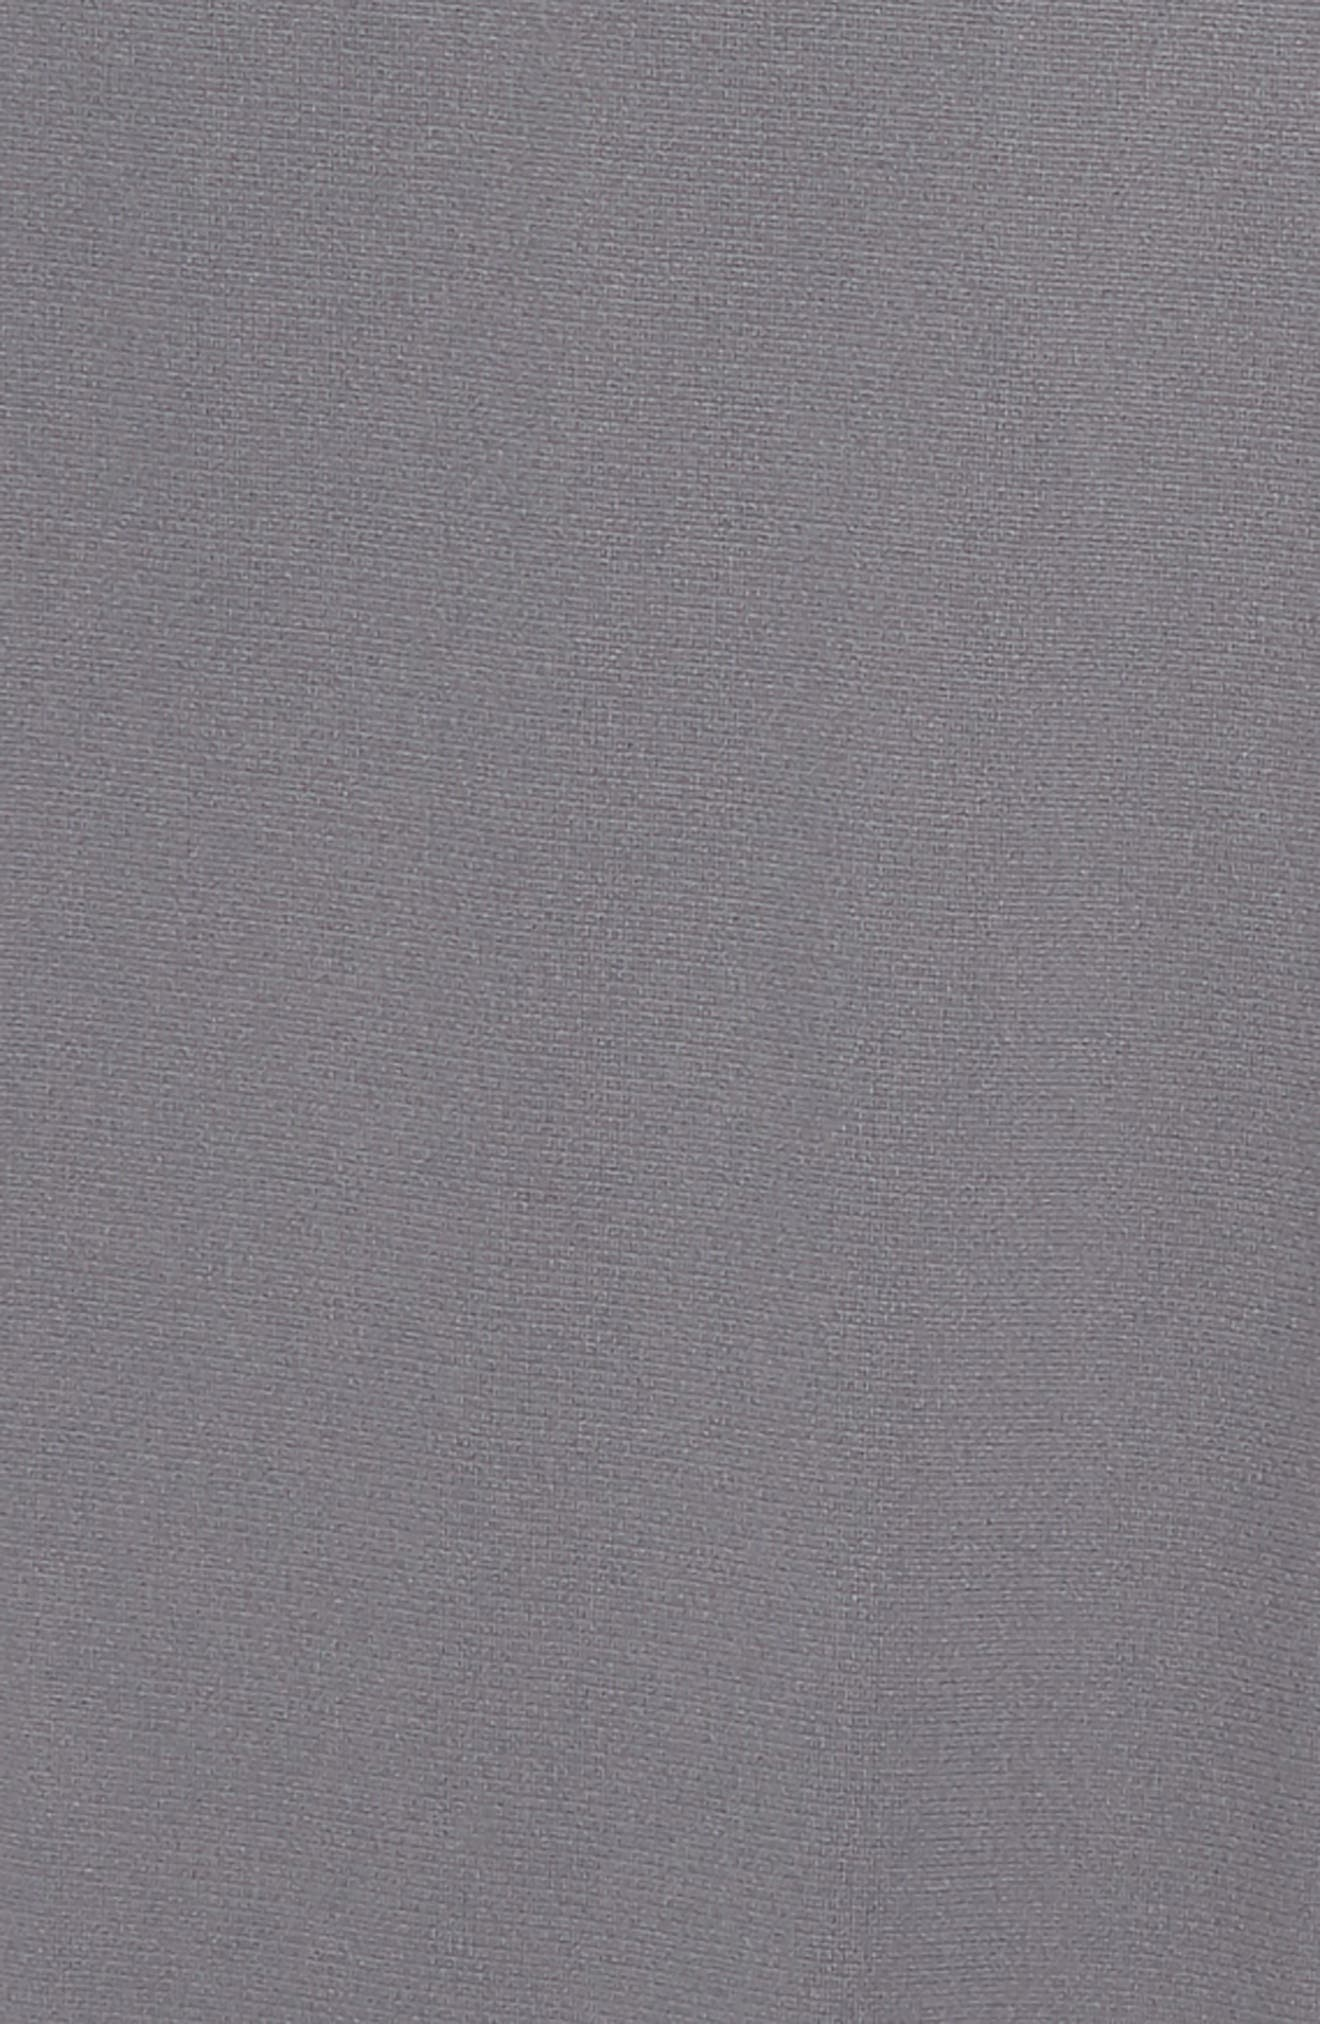 Brawler Slim Sweatpants,                             Alternate thumbnail 3, color,                             Graphite/ Black